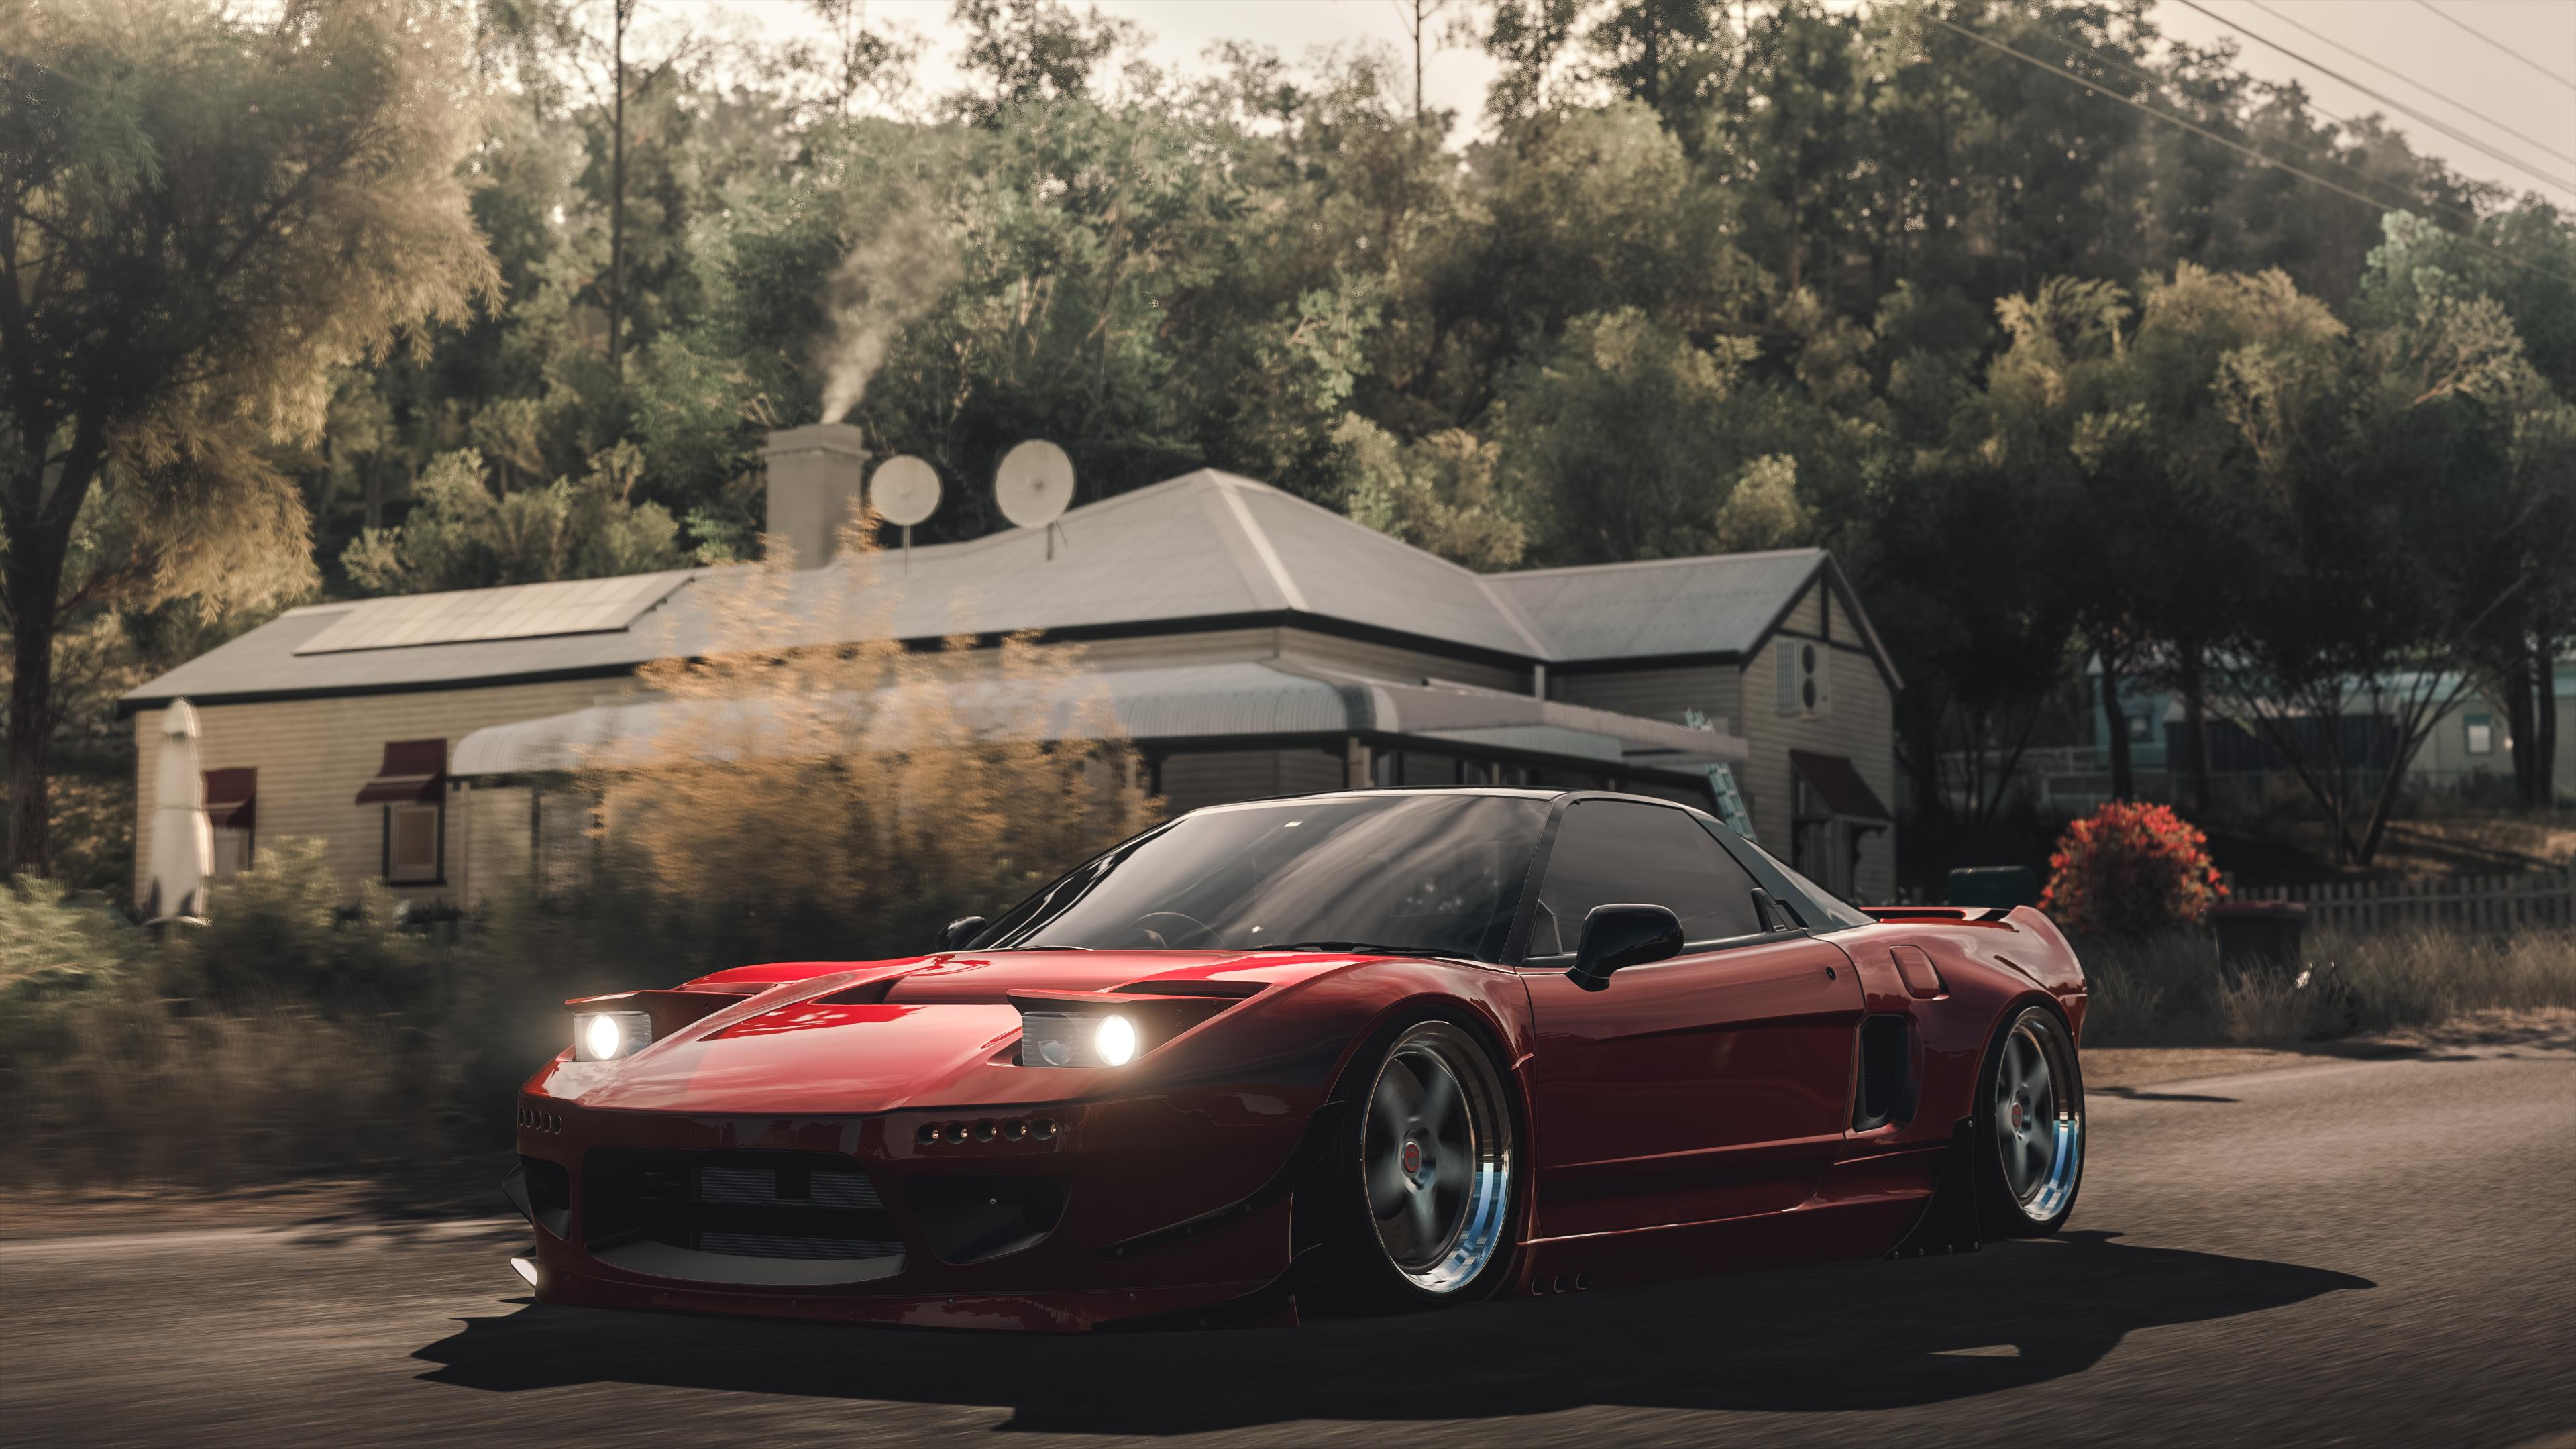 Mazda Rx7 Forza Horizon 3 4k, HD Cars, 4k Wallpapers